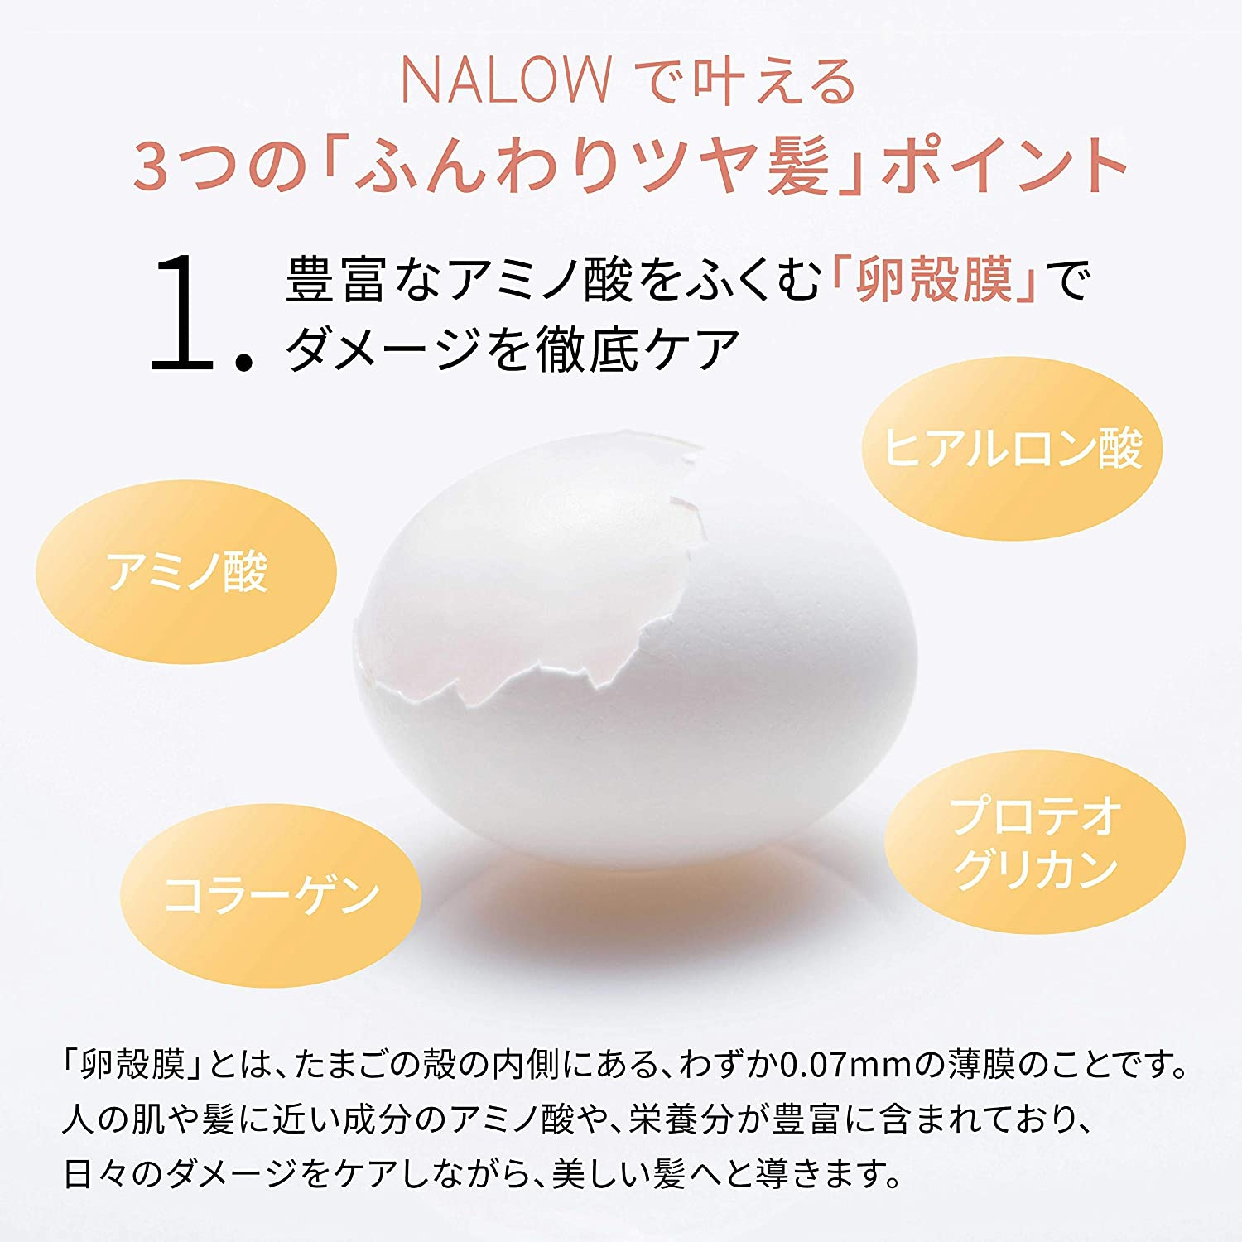 NALOW(ナロウ) ディープ モイスト シャンプーの商品画像3